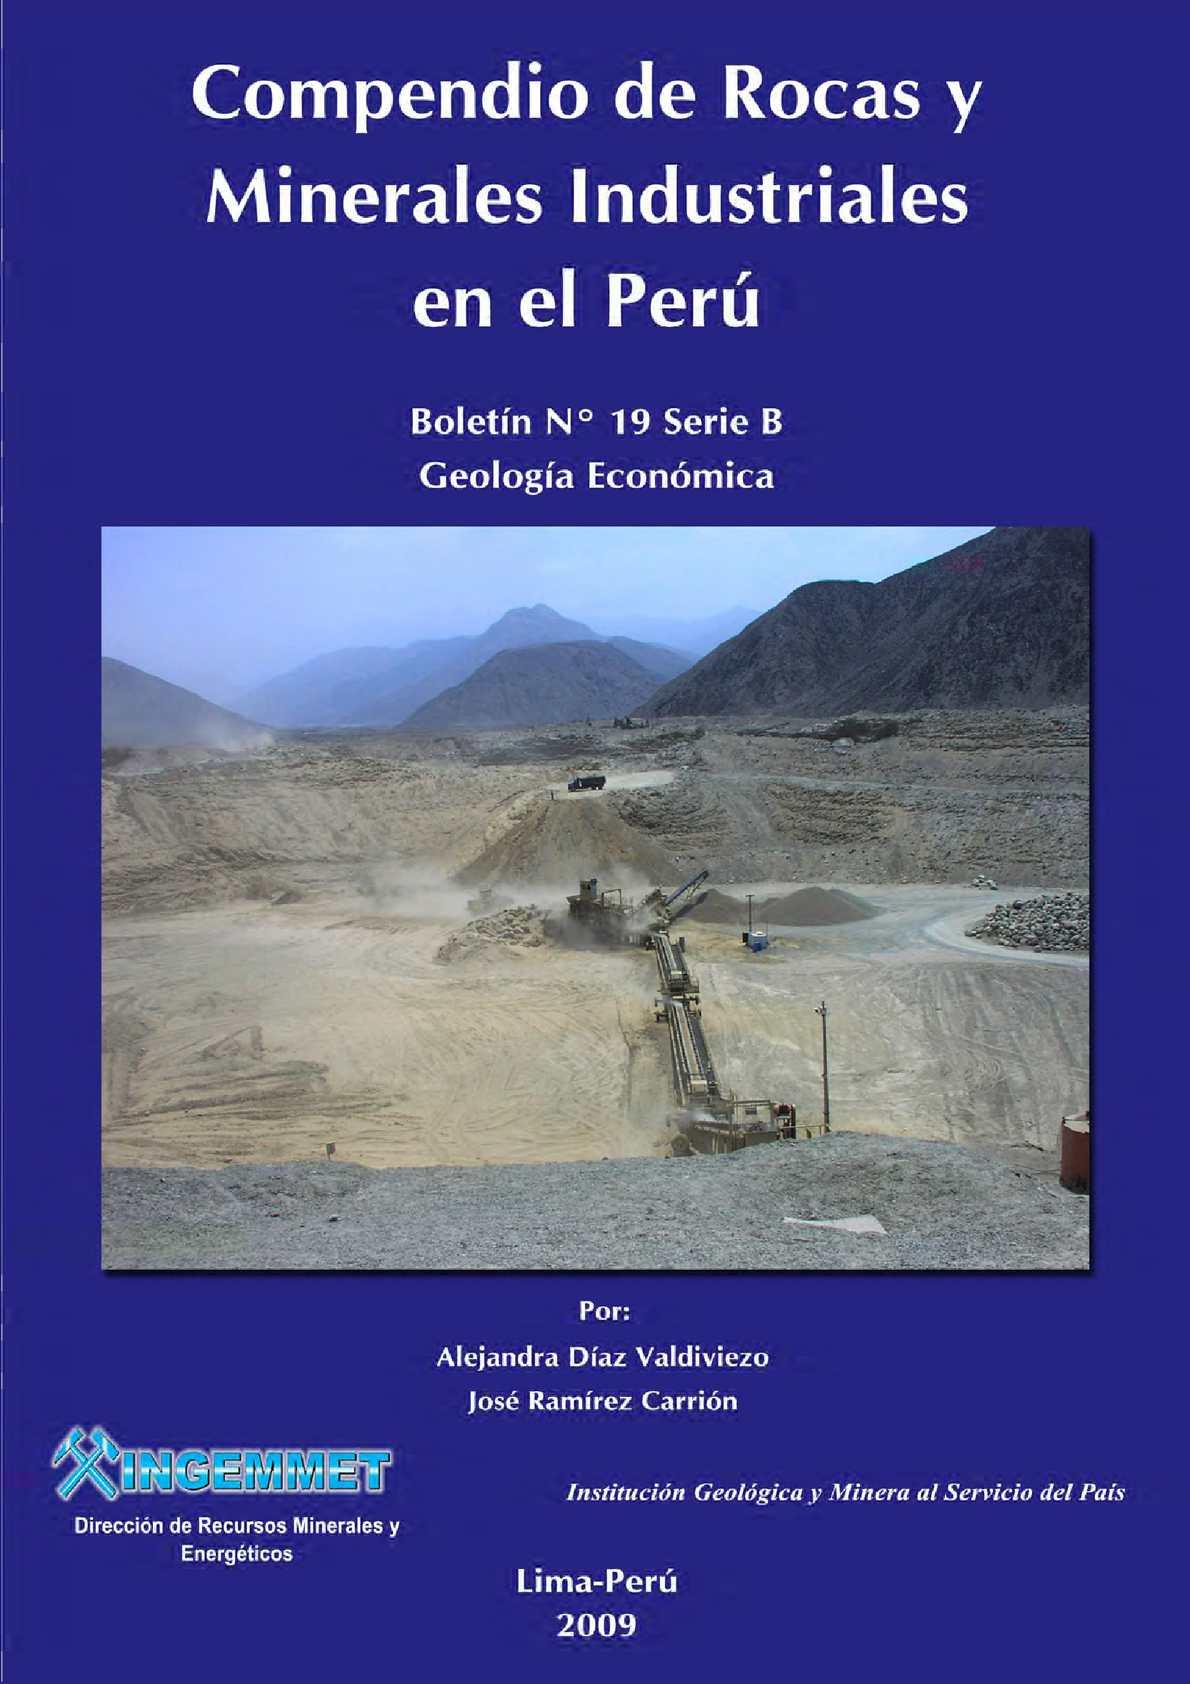 Calaméo - COMPENDIO DE ROCAS Y MINERALES INDUSTRIALES DEL PERÚ  2009 b9d4e6767942